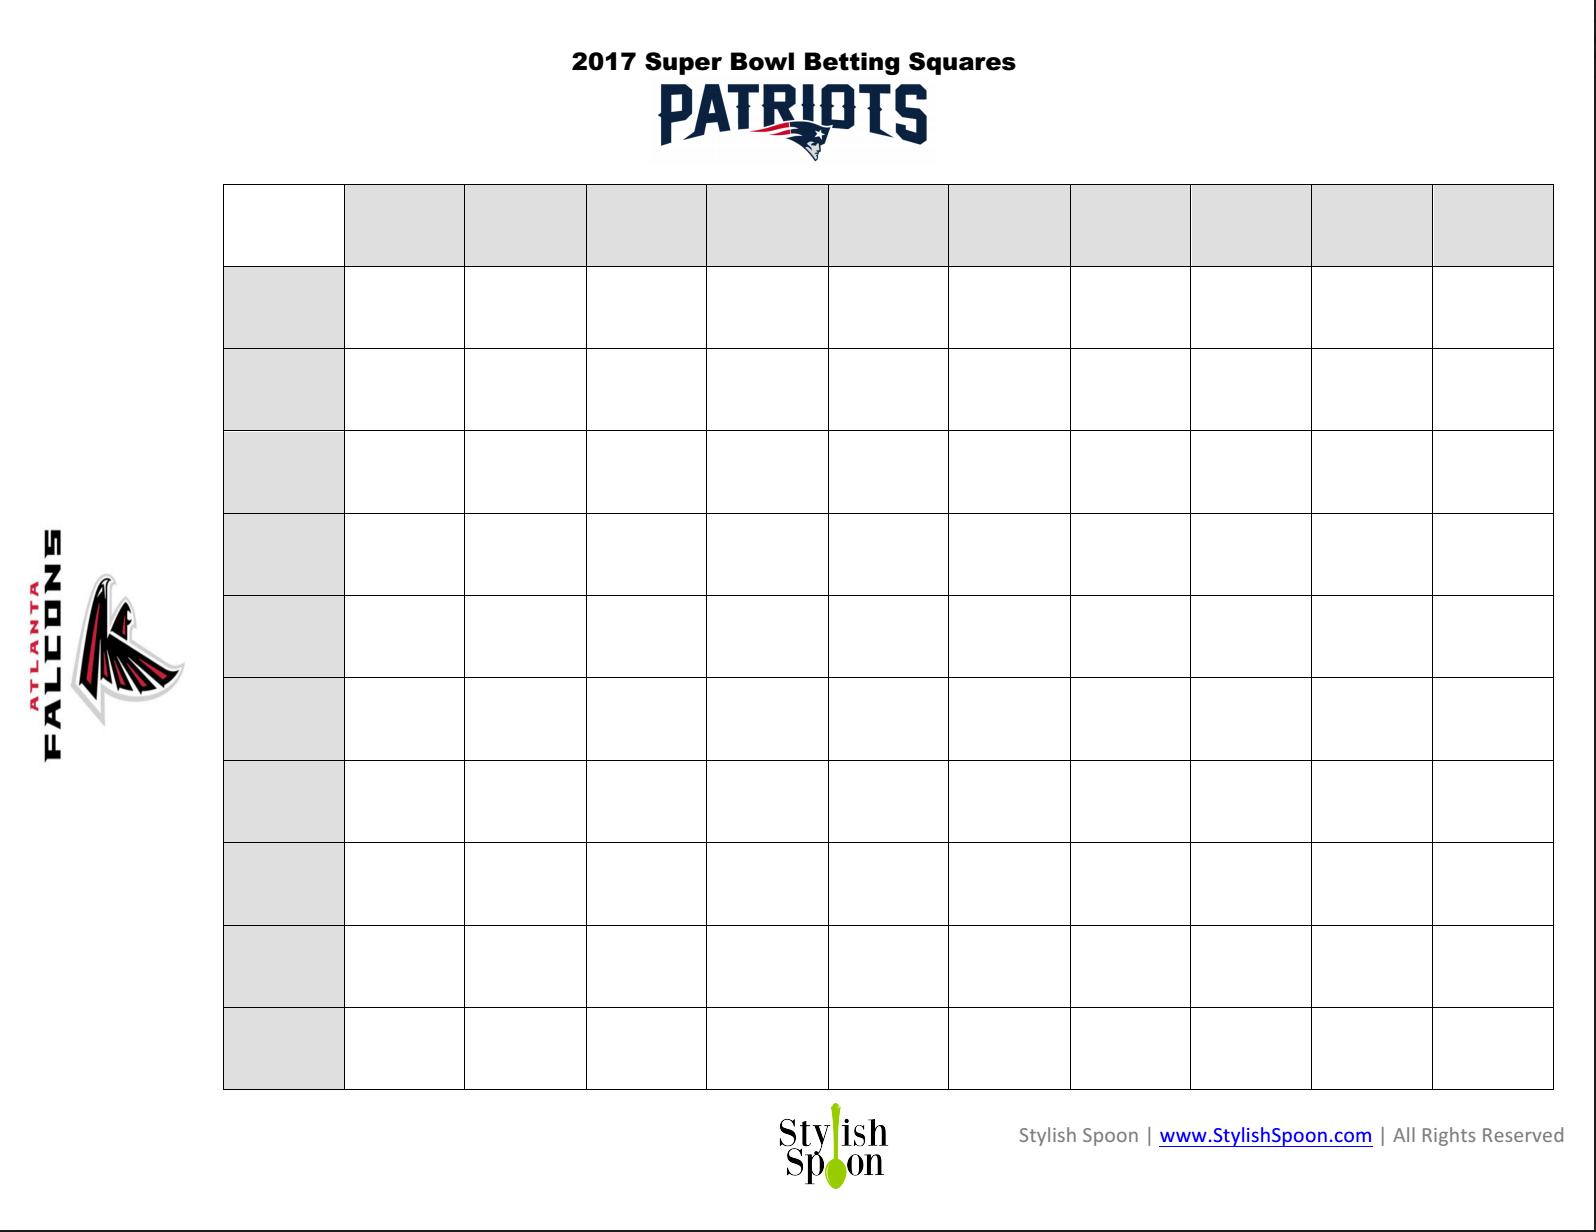 Free Printable 2017 Super Bowl Betting Squares  Stylish Spoon